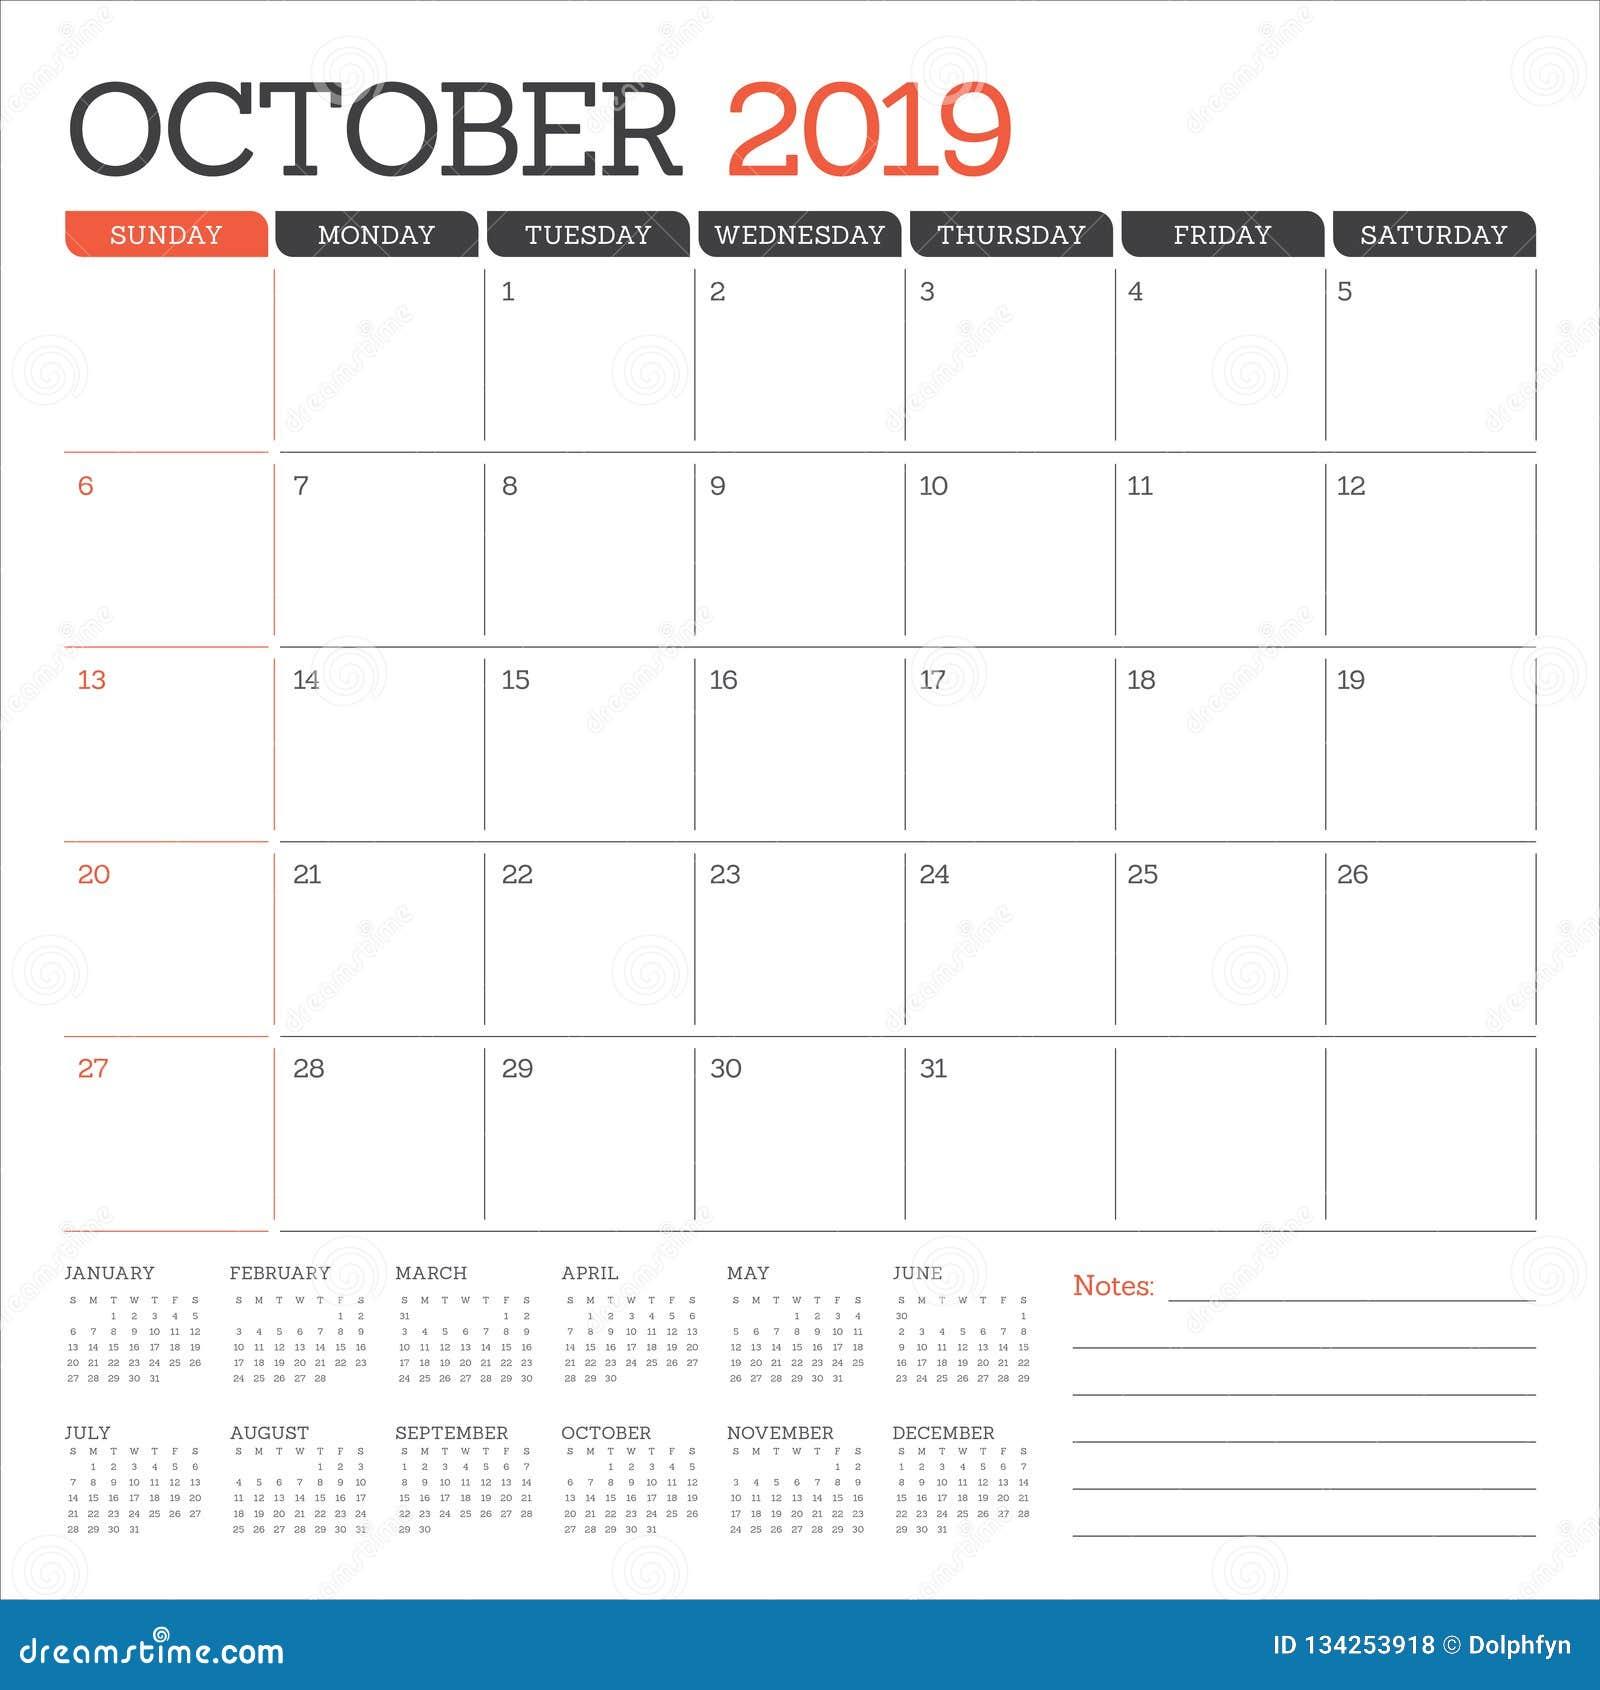 October 2019 Monthly Calendar Vector Illustration Stock